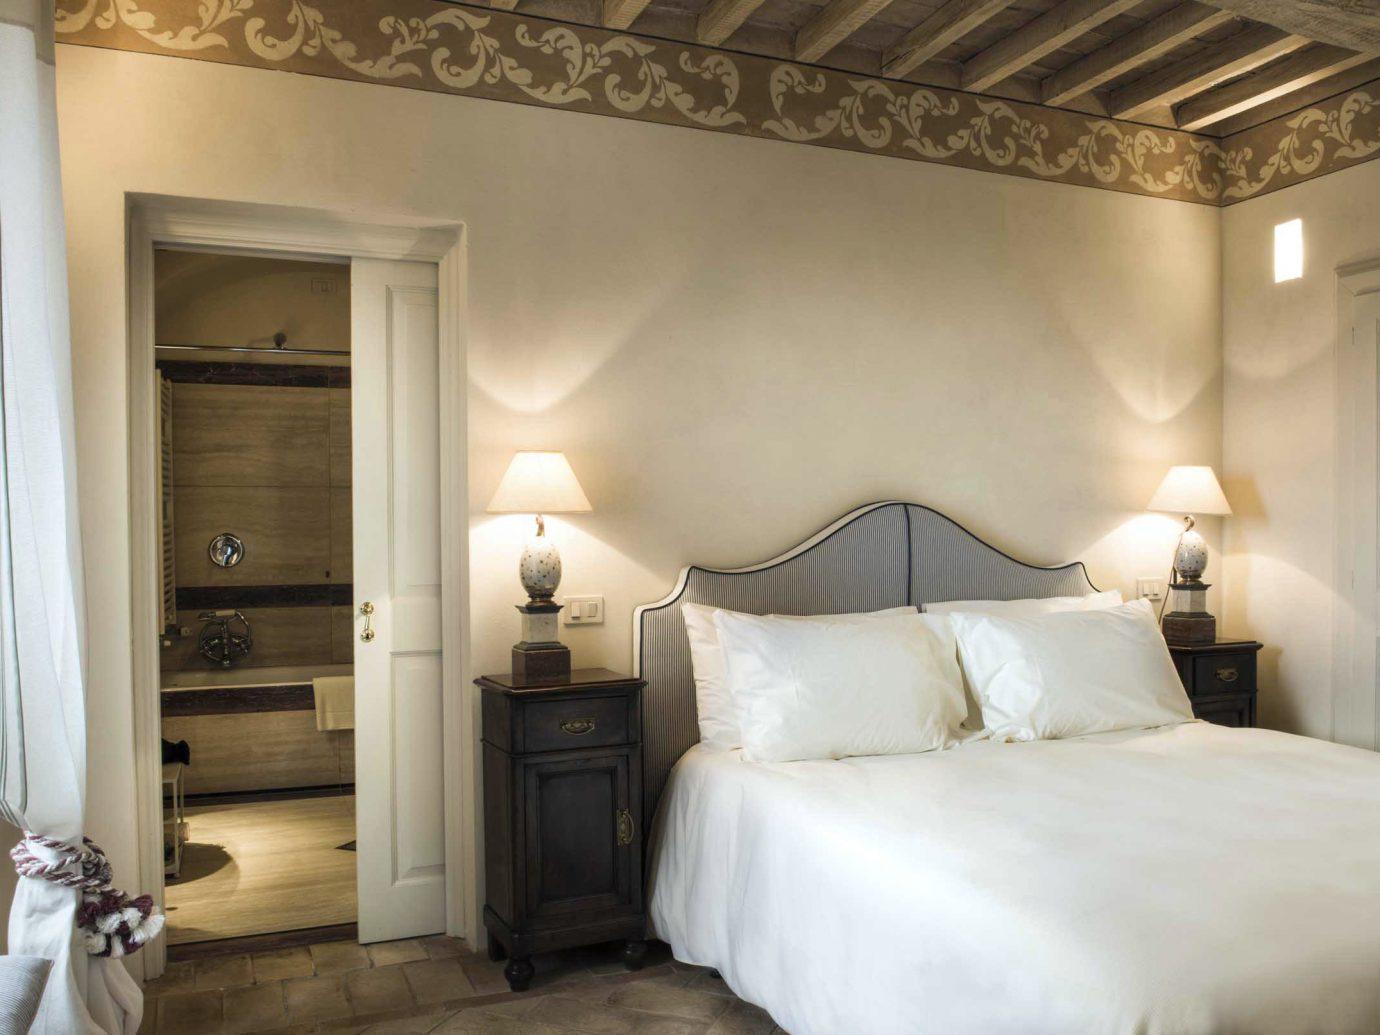 Bedroom Honeymoon Italy Luxury Romance Romantic Trip Ideas indoor bed wall room property ceiling Suite estate interior design cottage floor hotel real estate tan